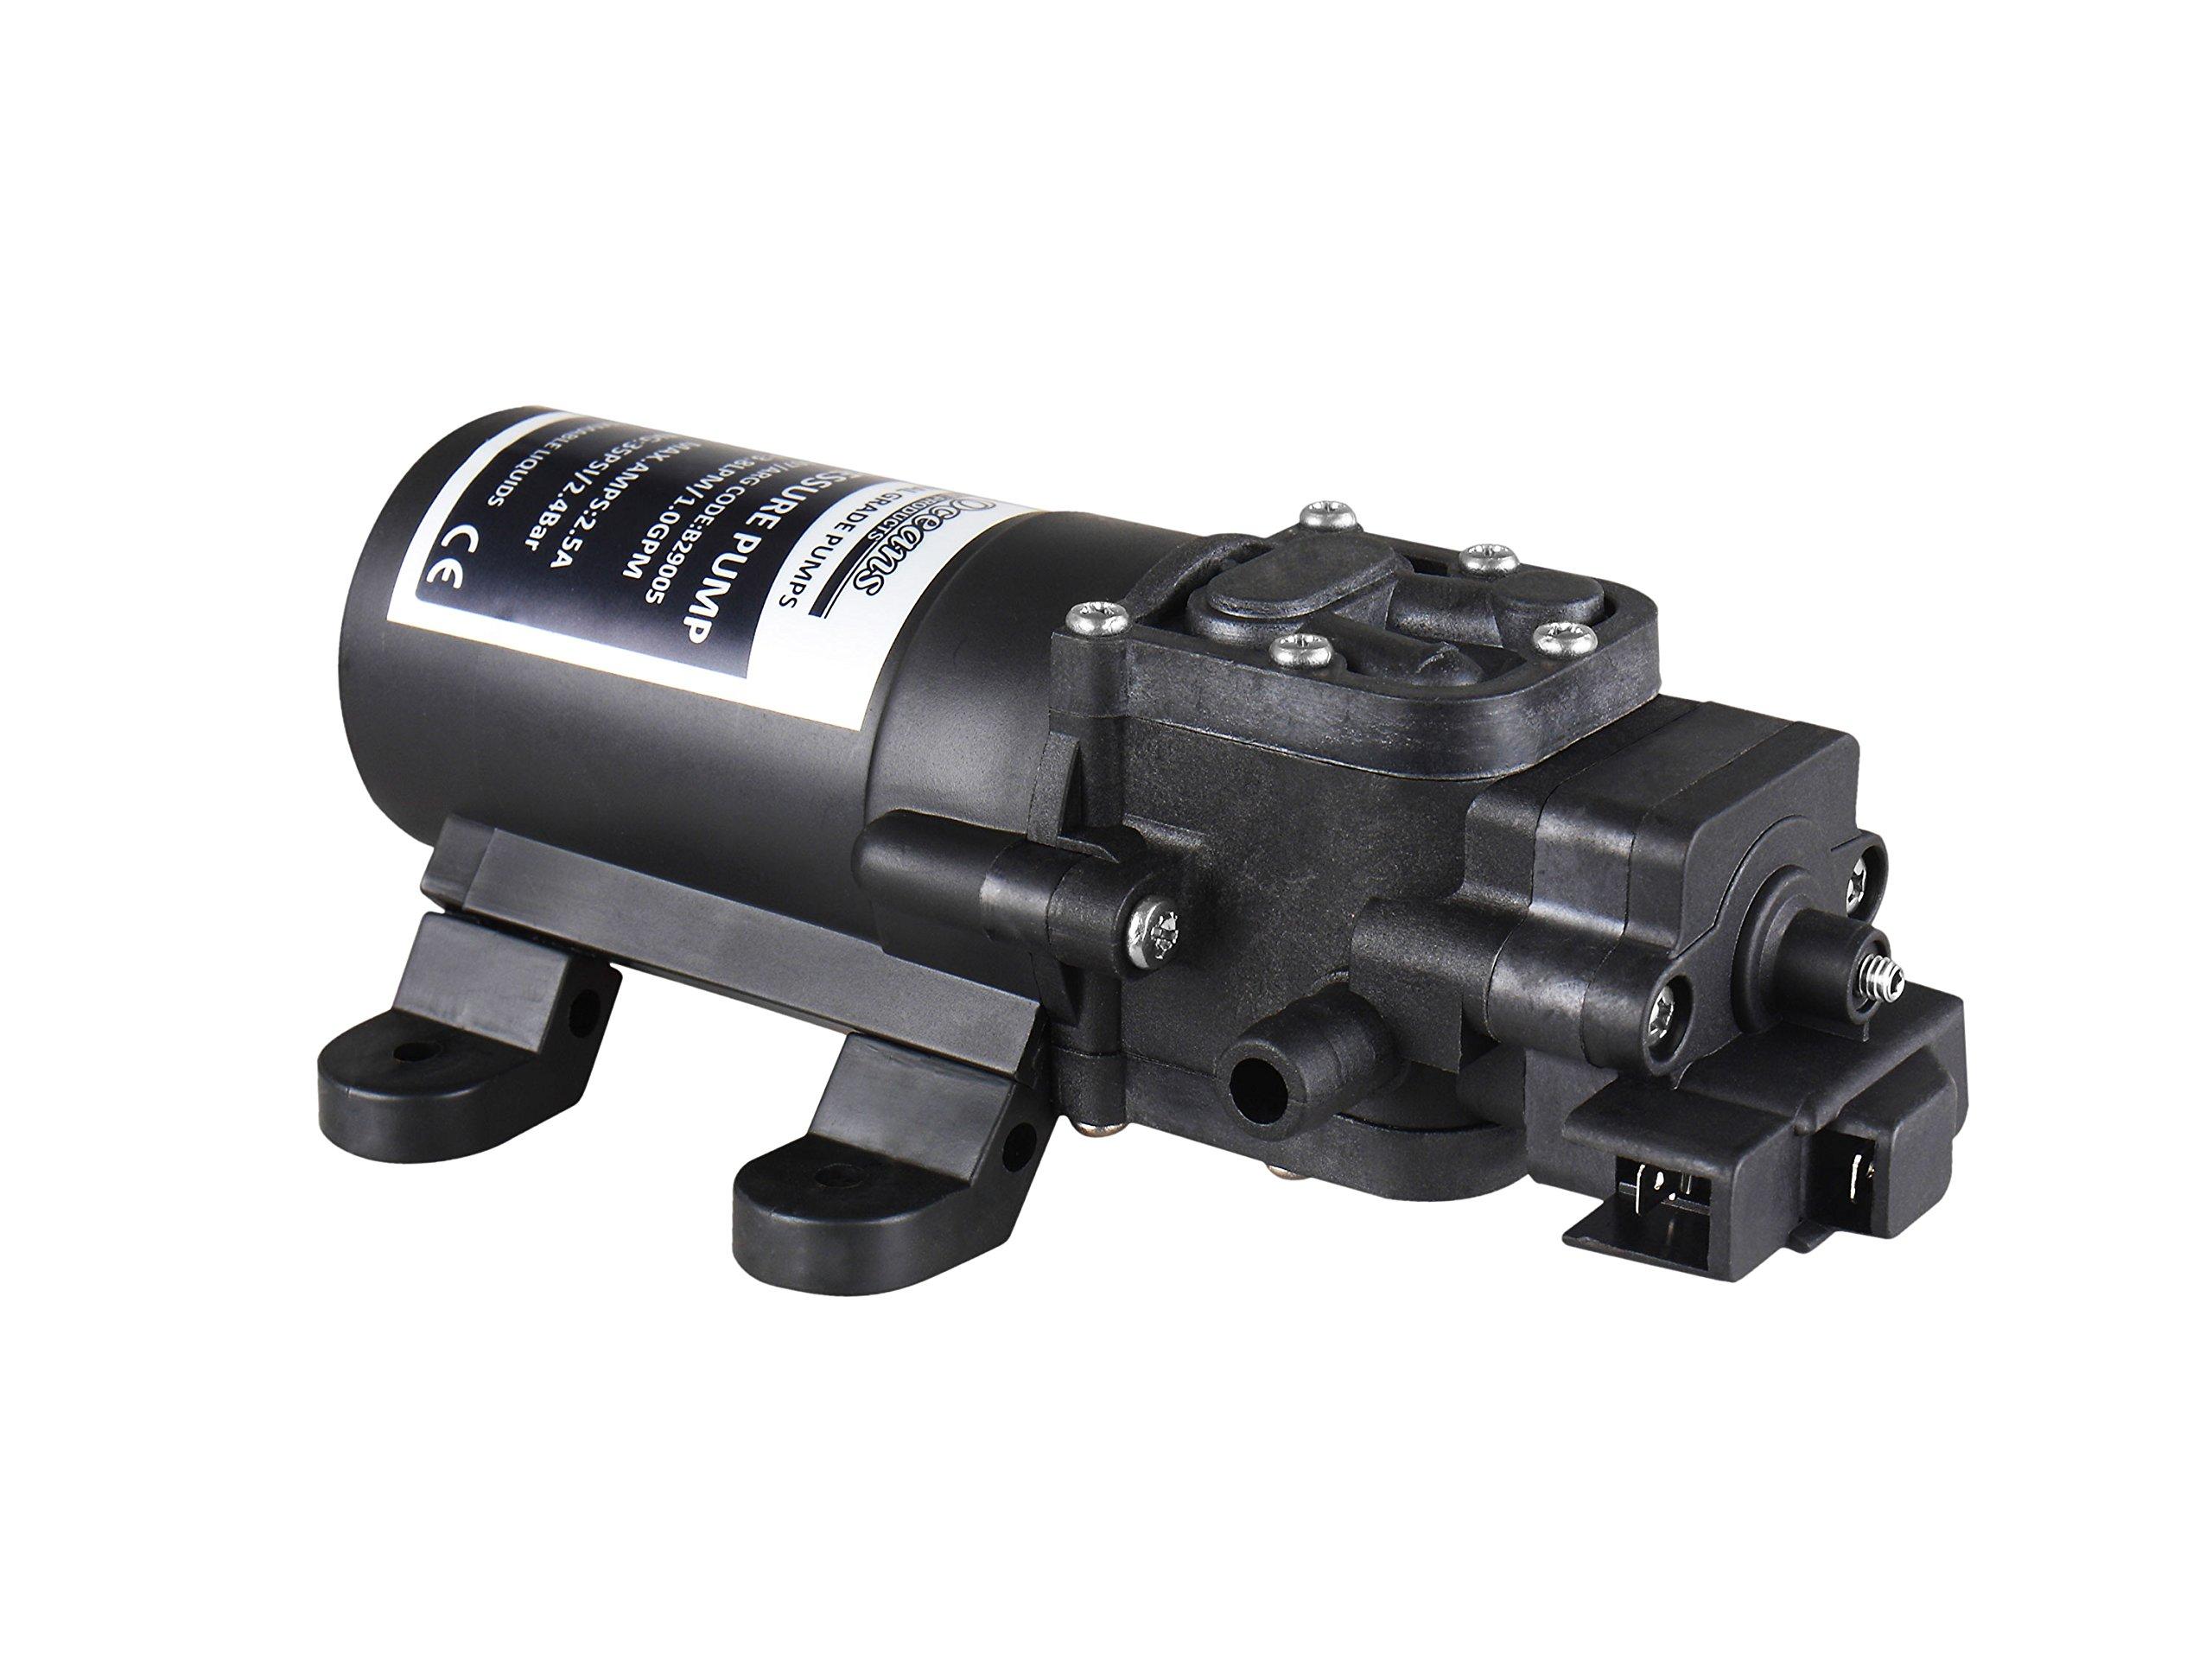 Five Oceans Automatic Diaphragm Water Pressure Pump, 1.0 GPM FO-3607